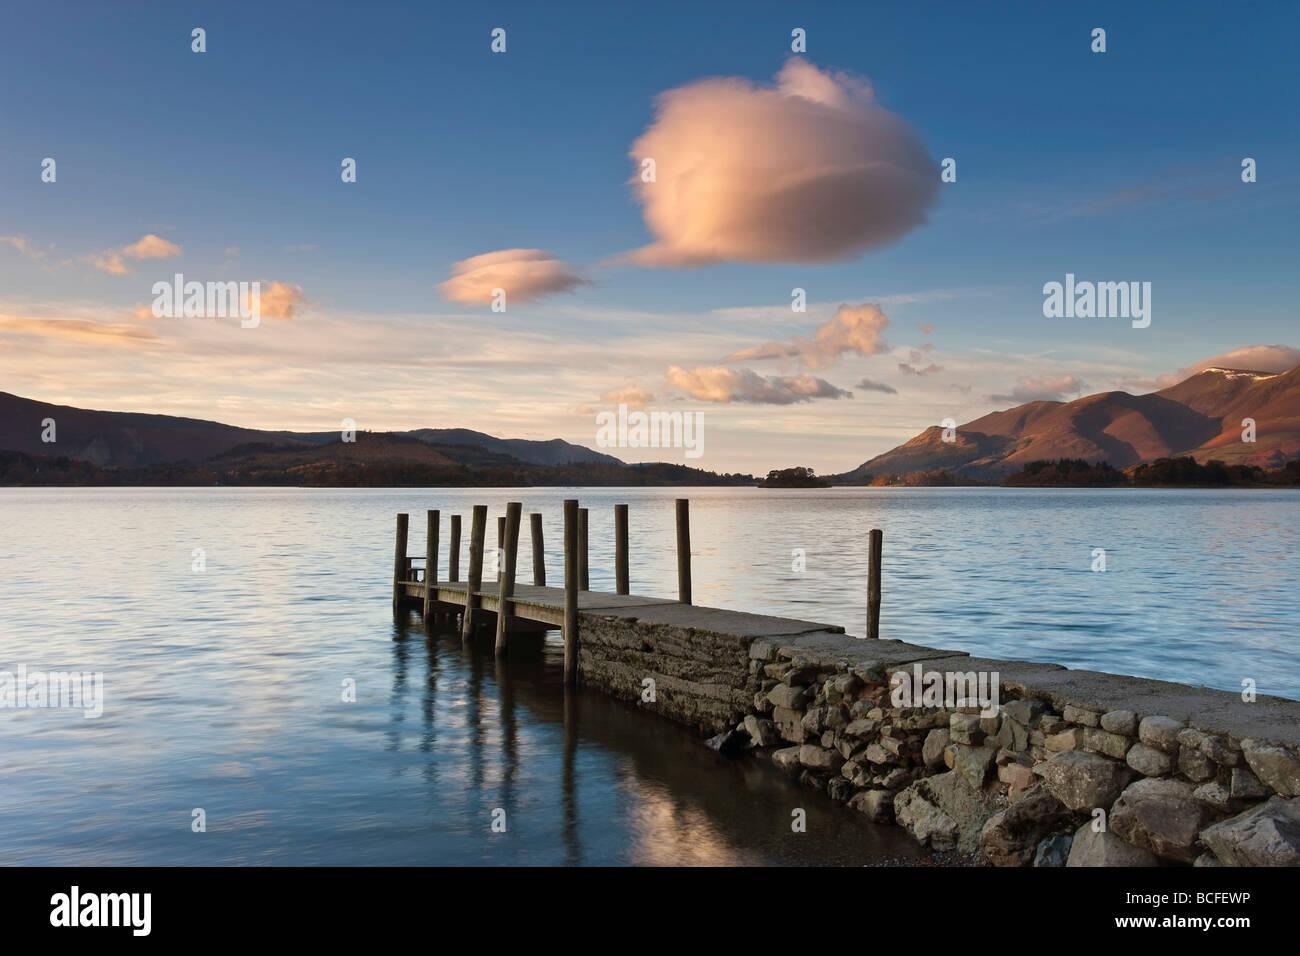 Barrow Bay, Derwent Water, Lake District, Cumbria, England - Stock Image